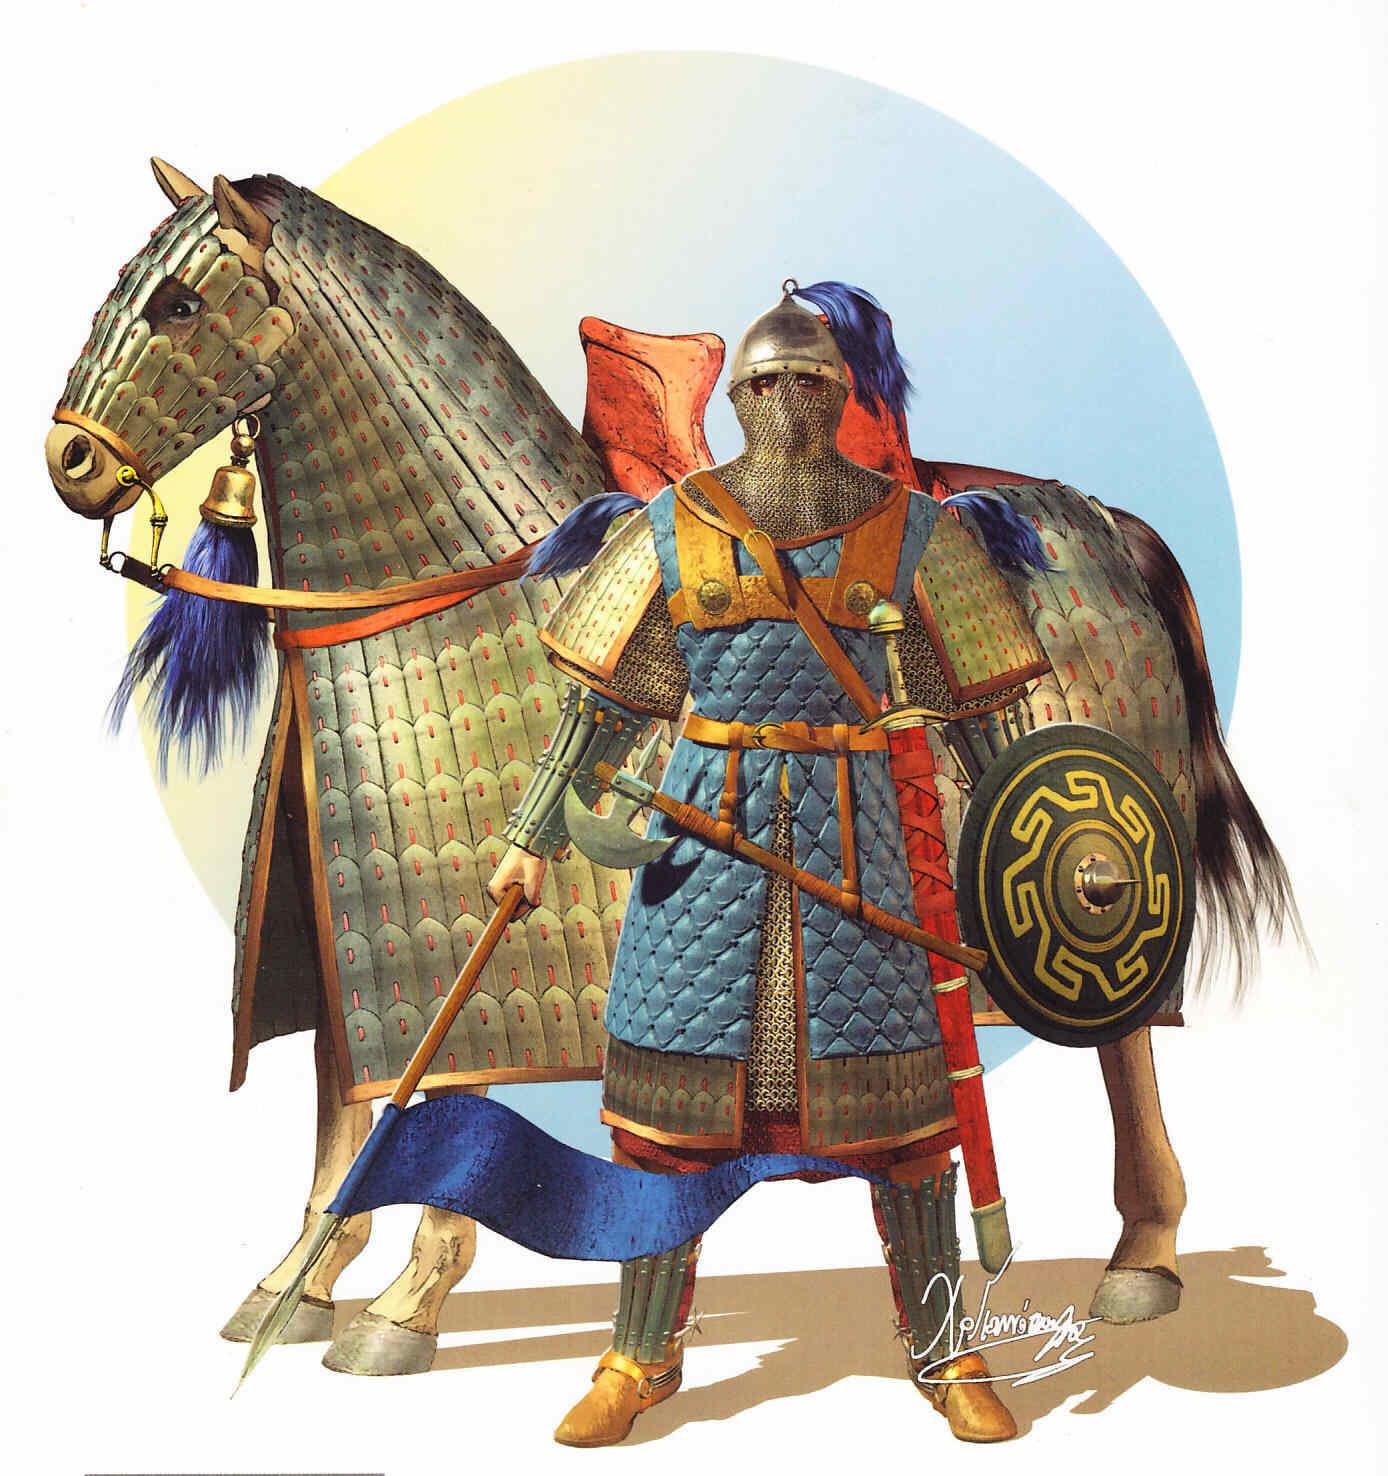 Egipto antiguo 35 y Ptolomeo V Epífanes 3